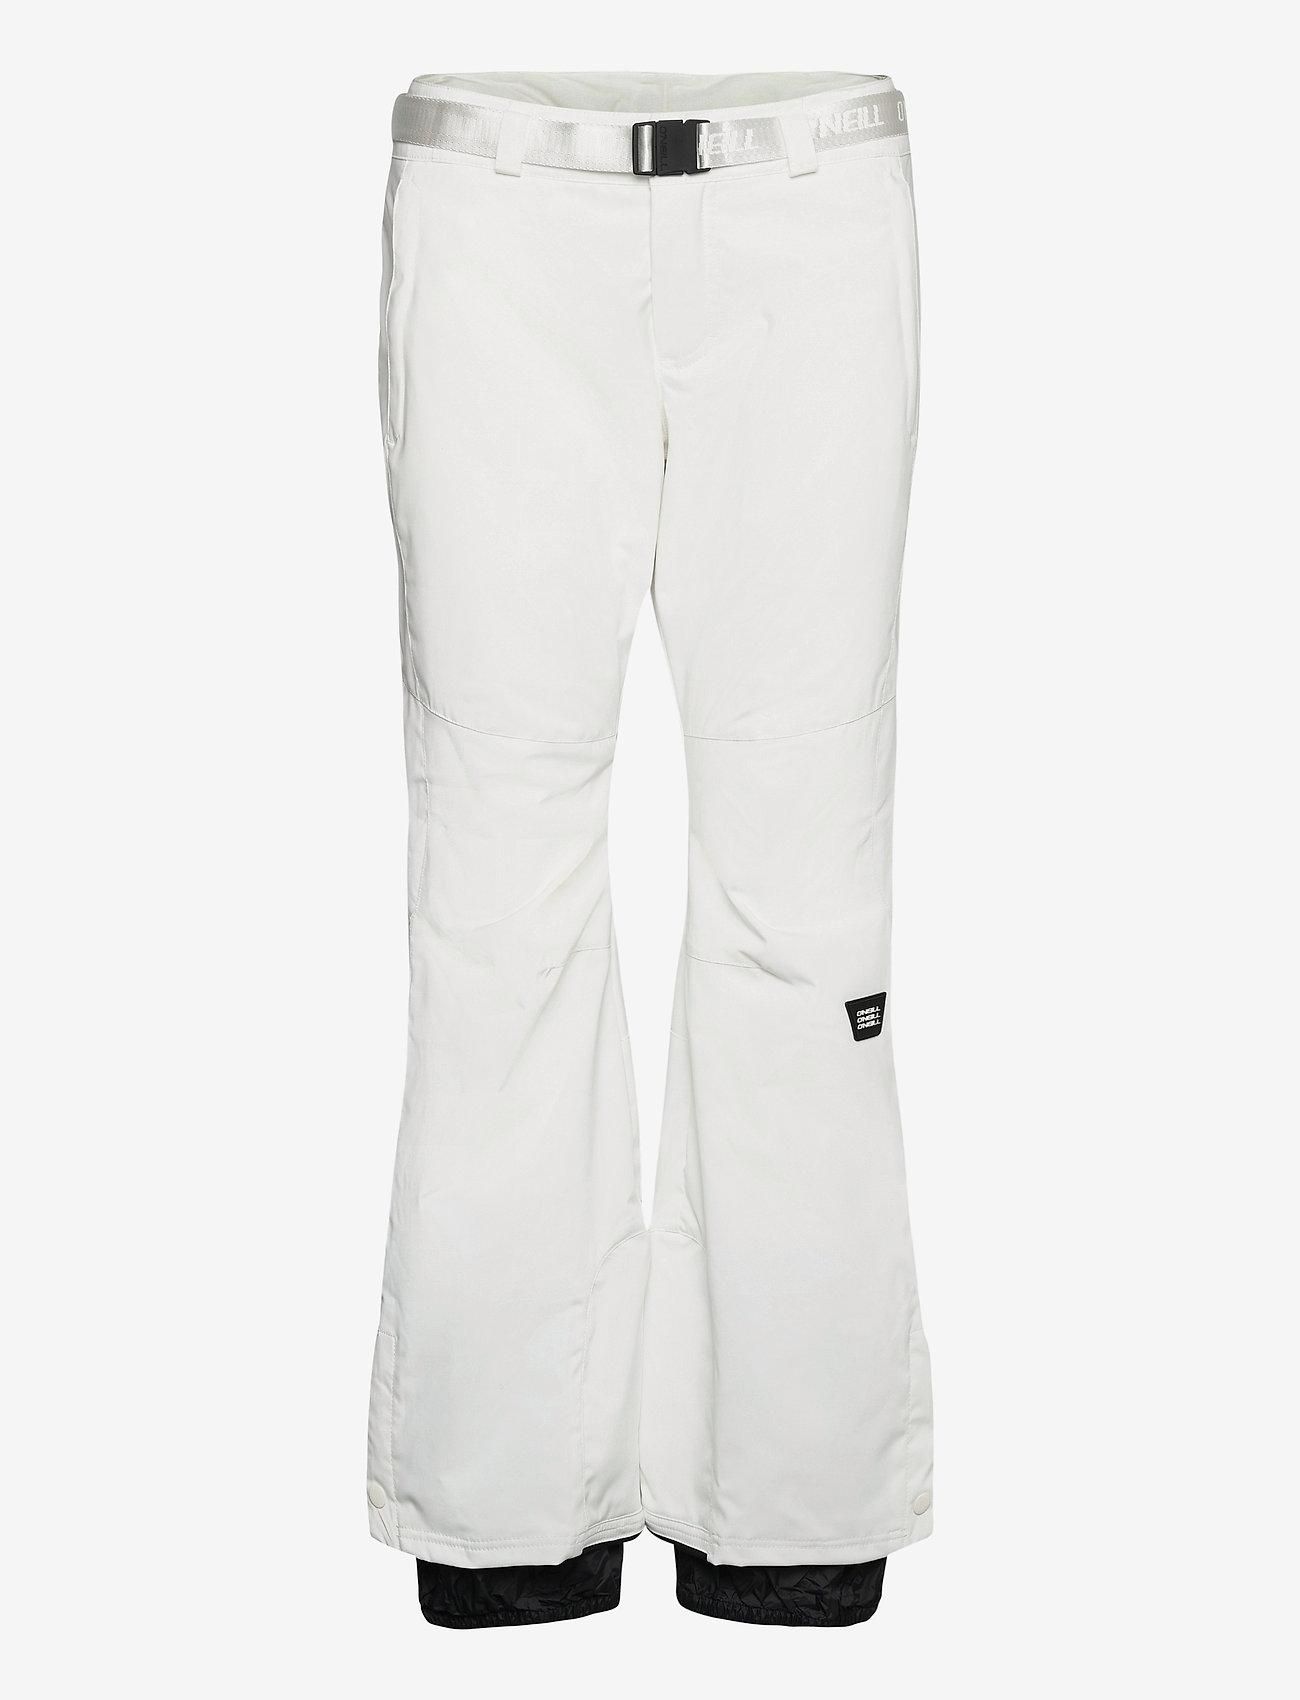 O'Neill - PW STAR SLIM PANTS - skibroeken - powder white - 0